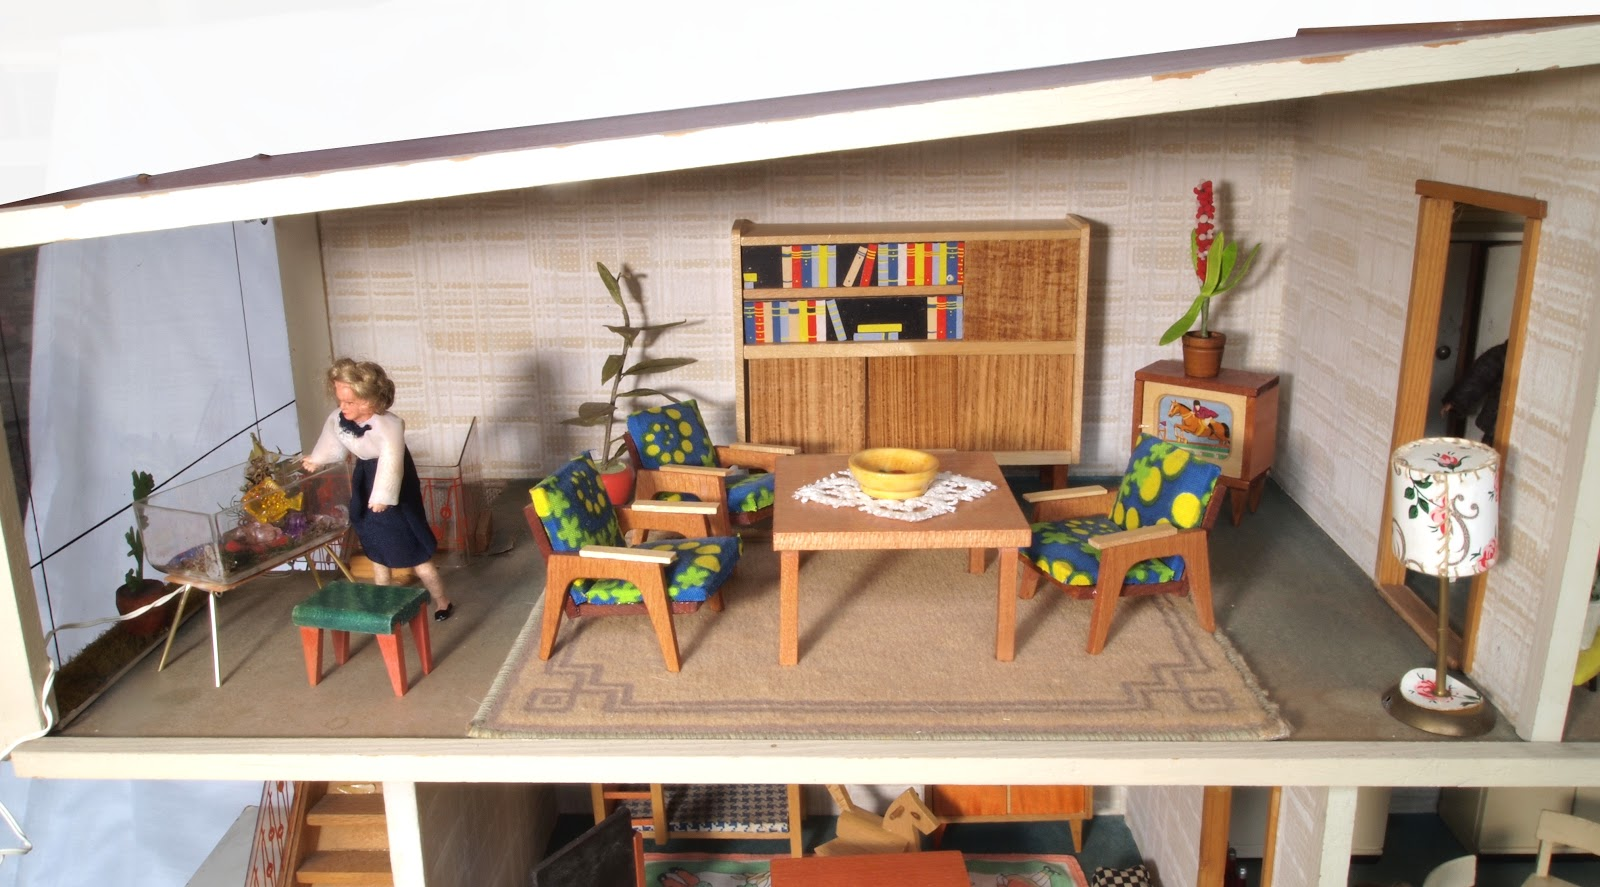 diepuppenstubensammlerin puppenhaus 1968 vero dollhouse. Black Bedroom Furniture Sets. Home Design Ideas